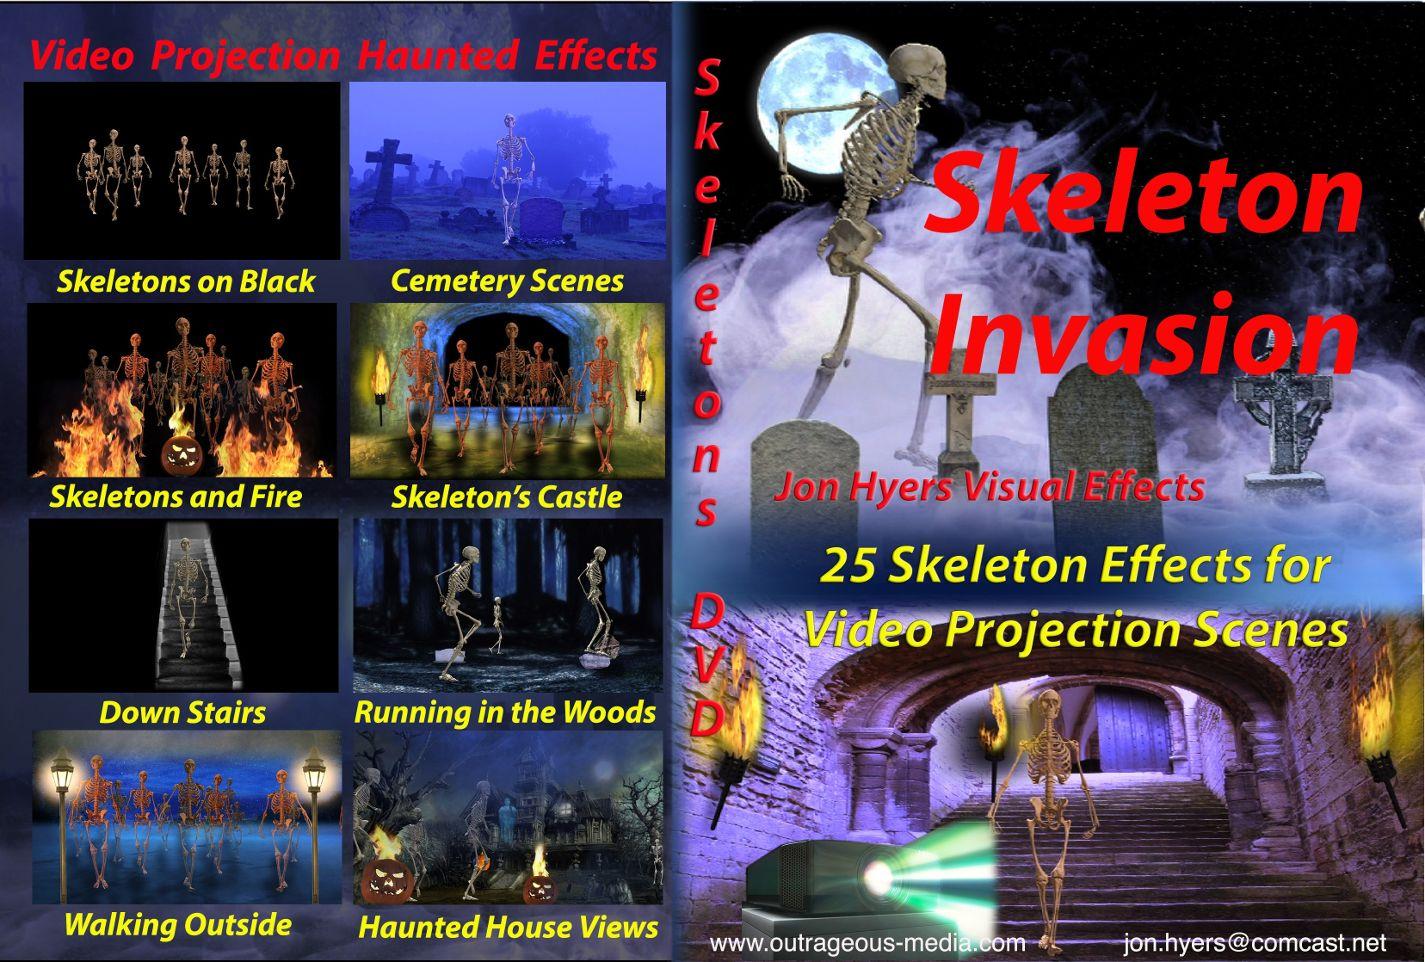 skeleton invasion projection dvd